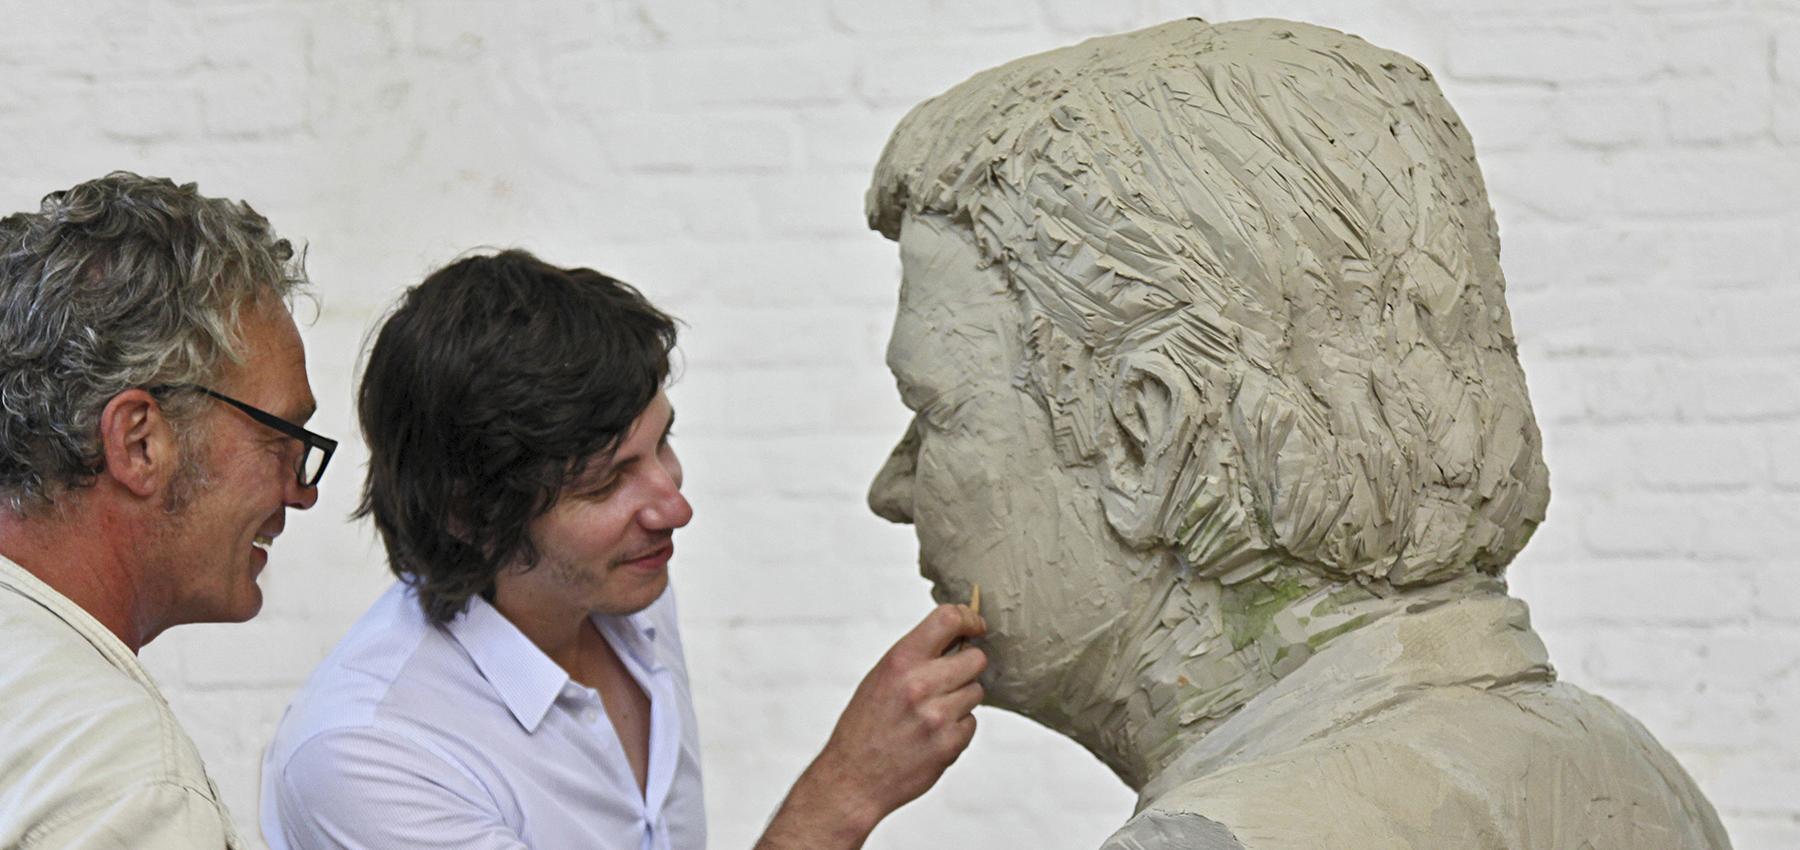 slide-ton-skulptur